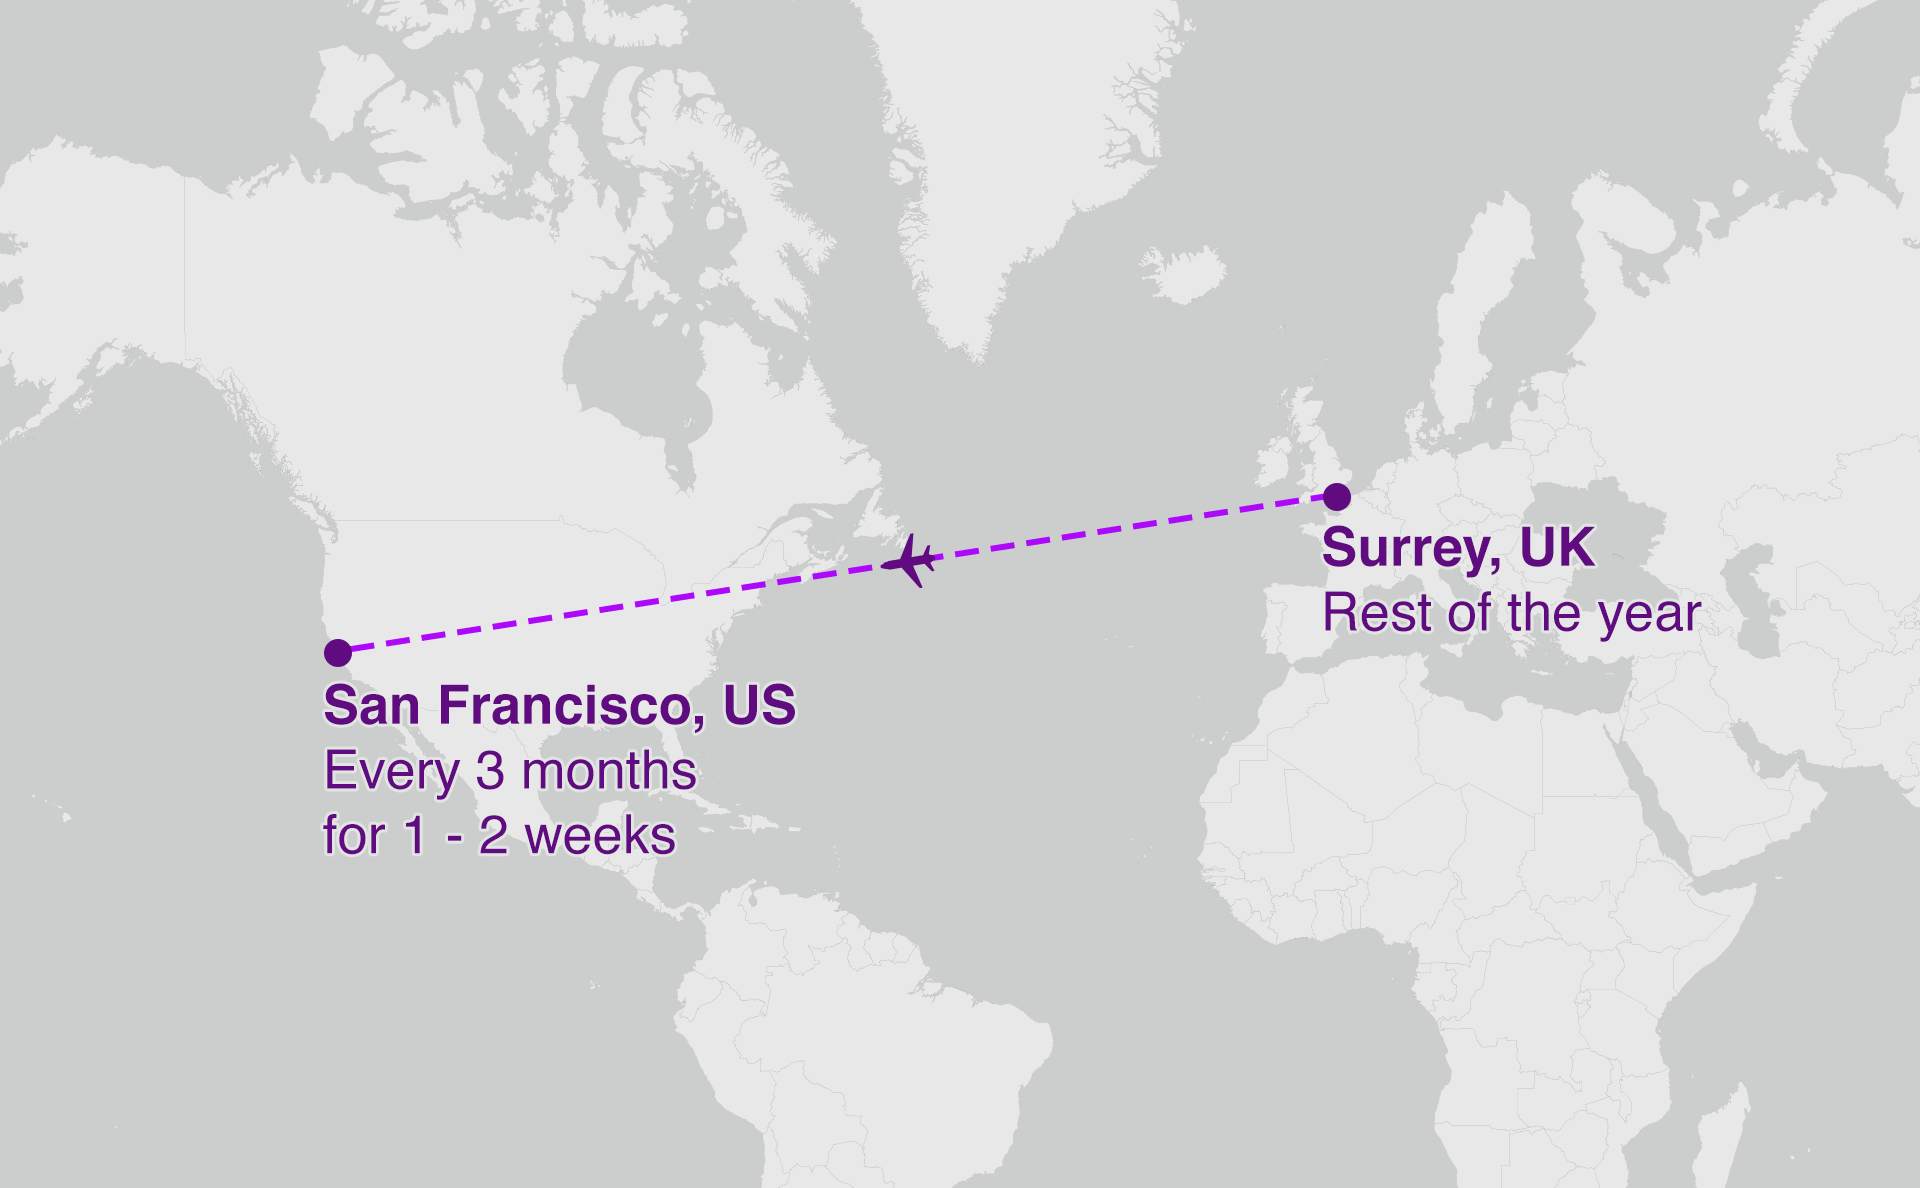 Map showing San Francisco to Surrey